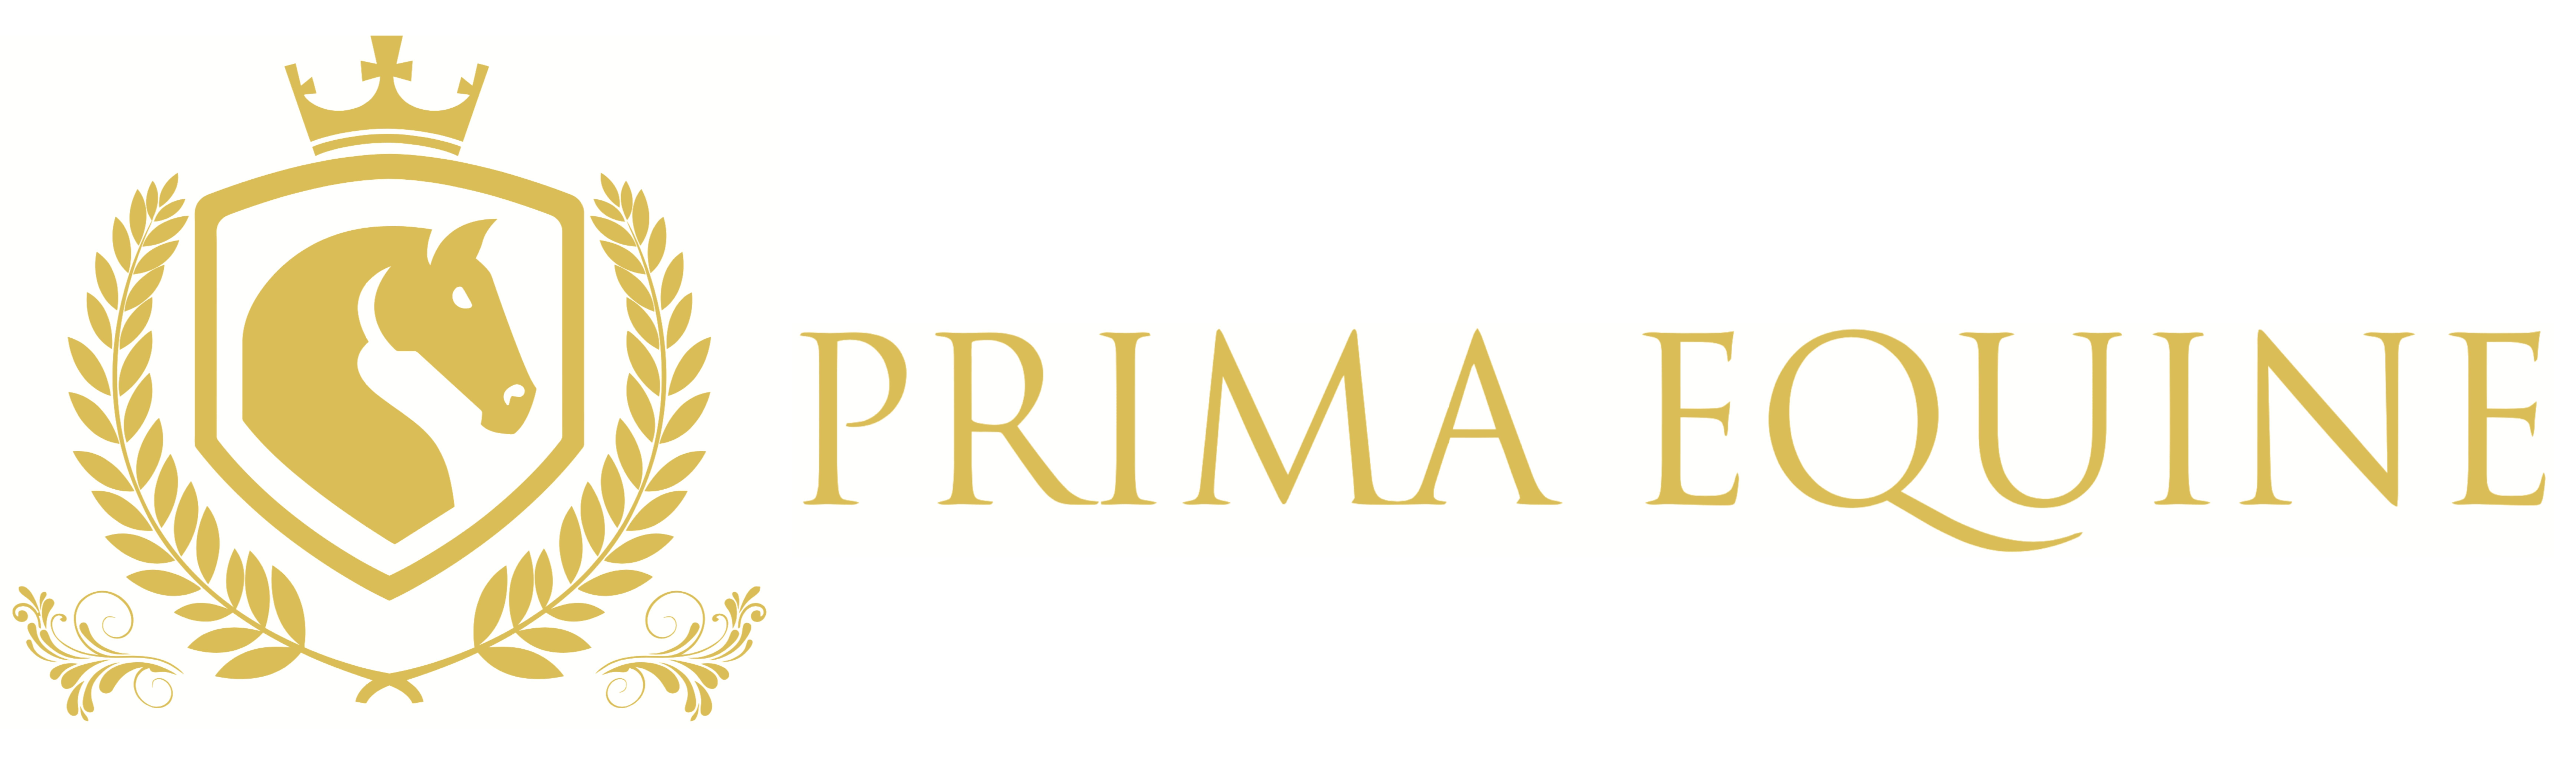 Read Prima Equine Reviews